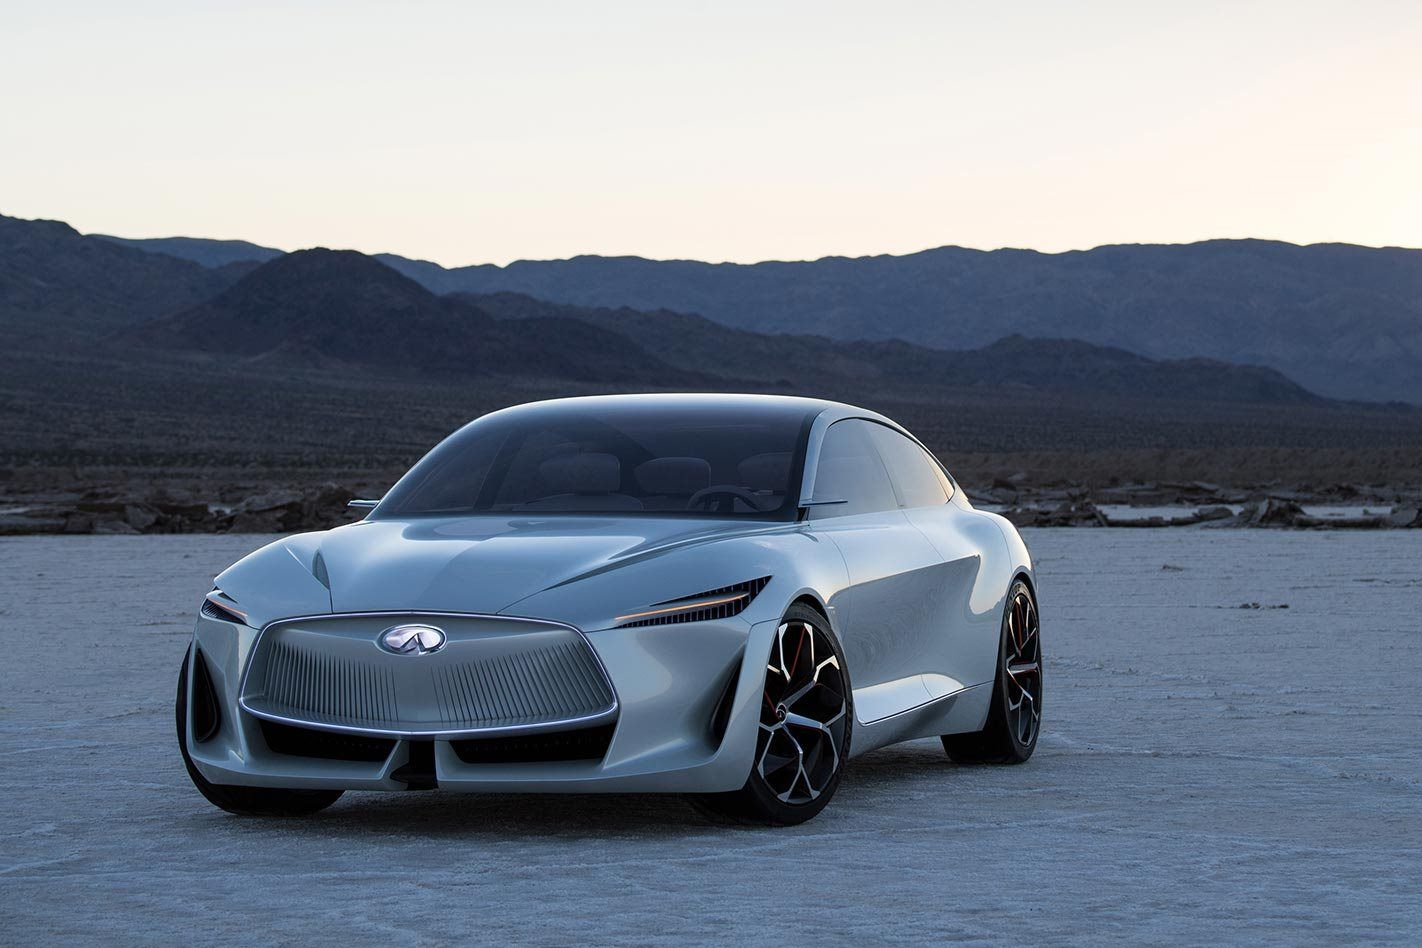 2021 Infiniti G35 Concept In 2020 Infiniti Q Sports Cars Luxury Car